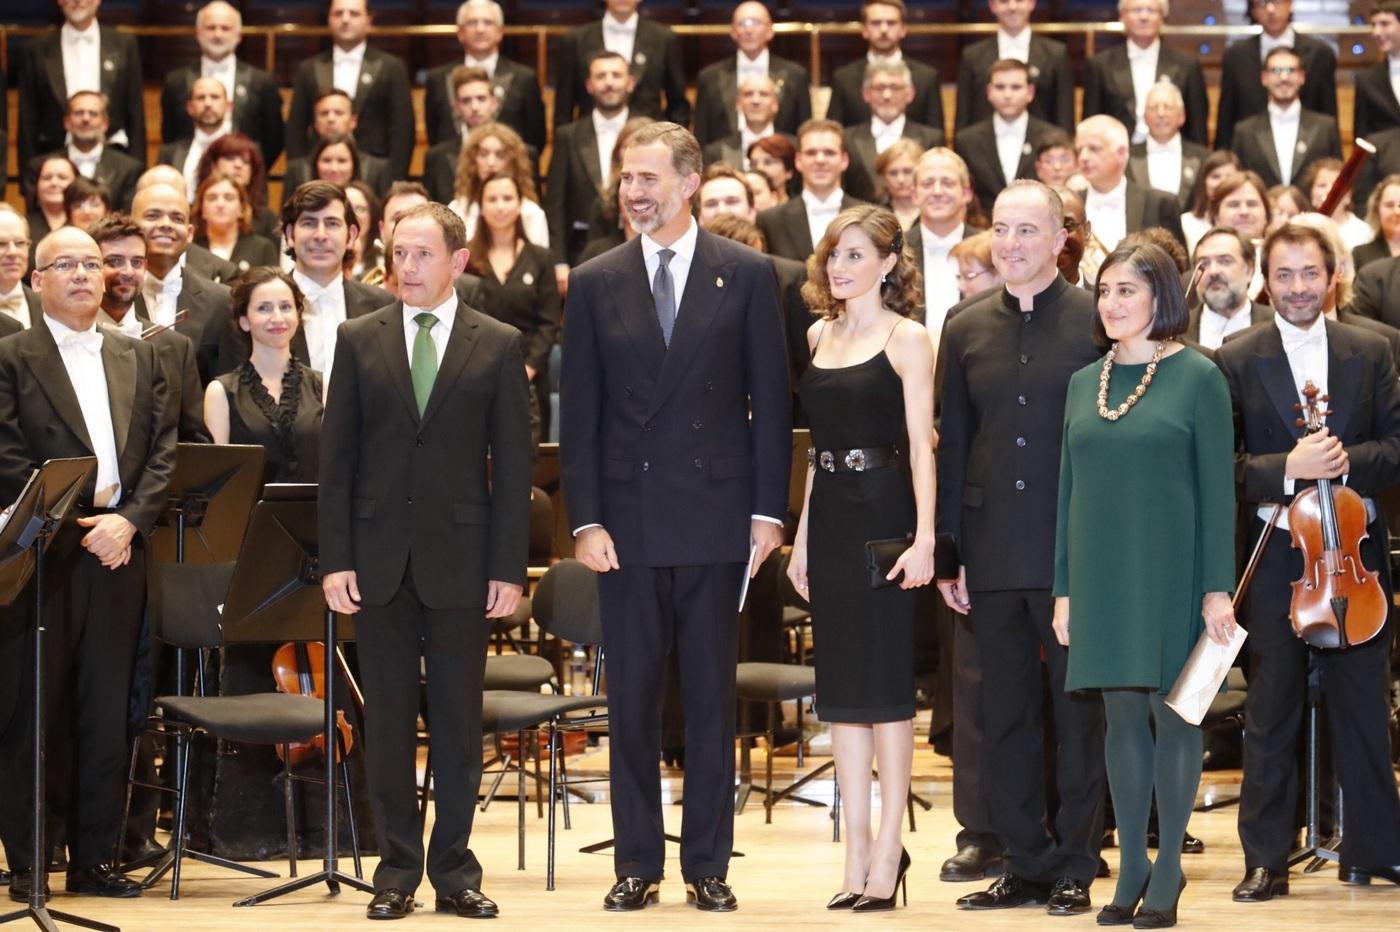 reyes_premios_princesa_asturias_concierto_20161020_13